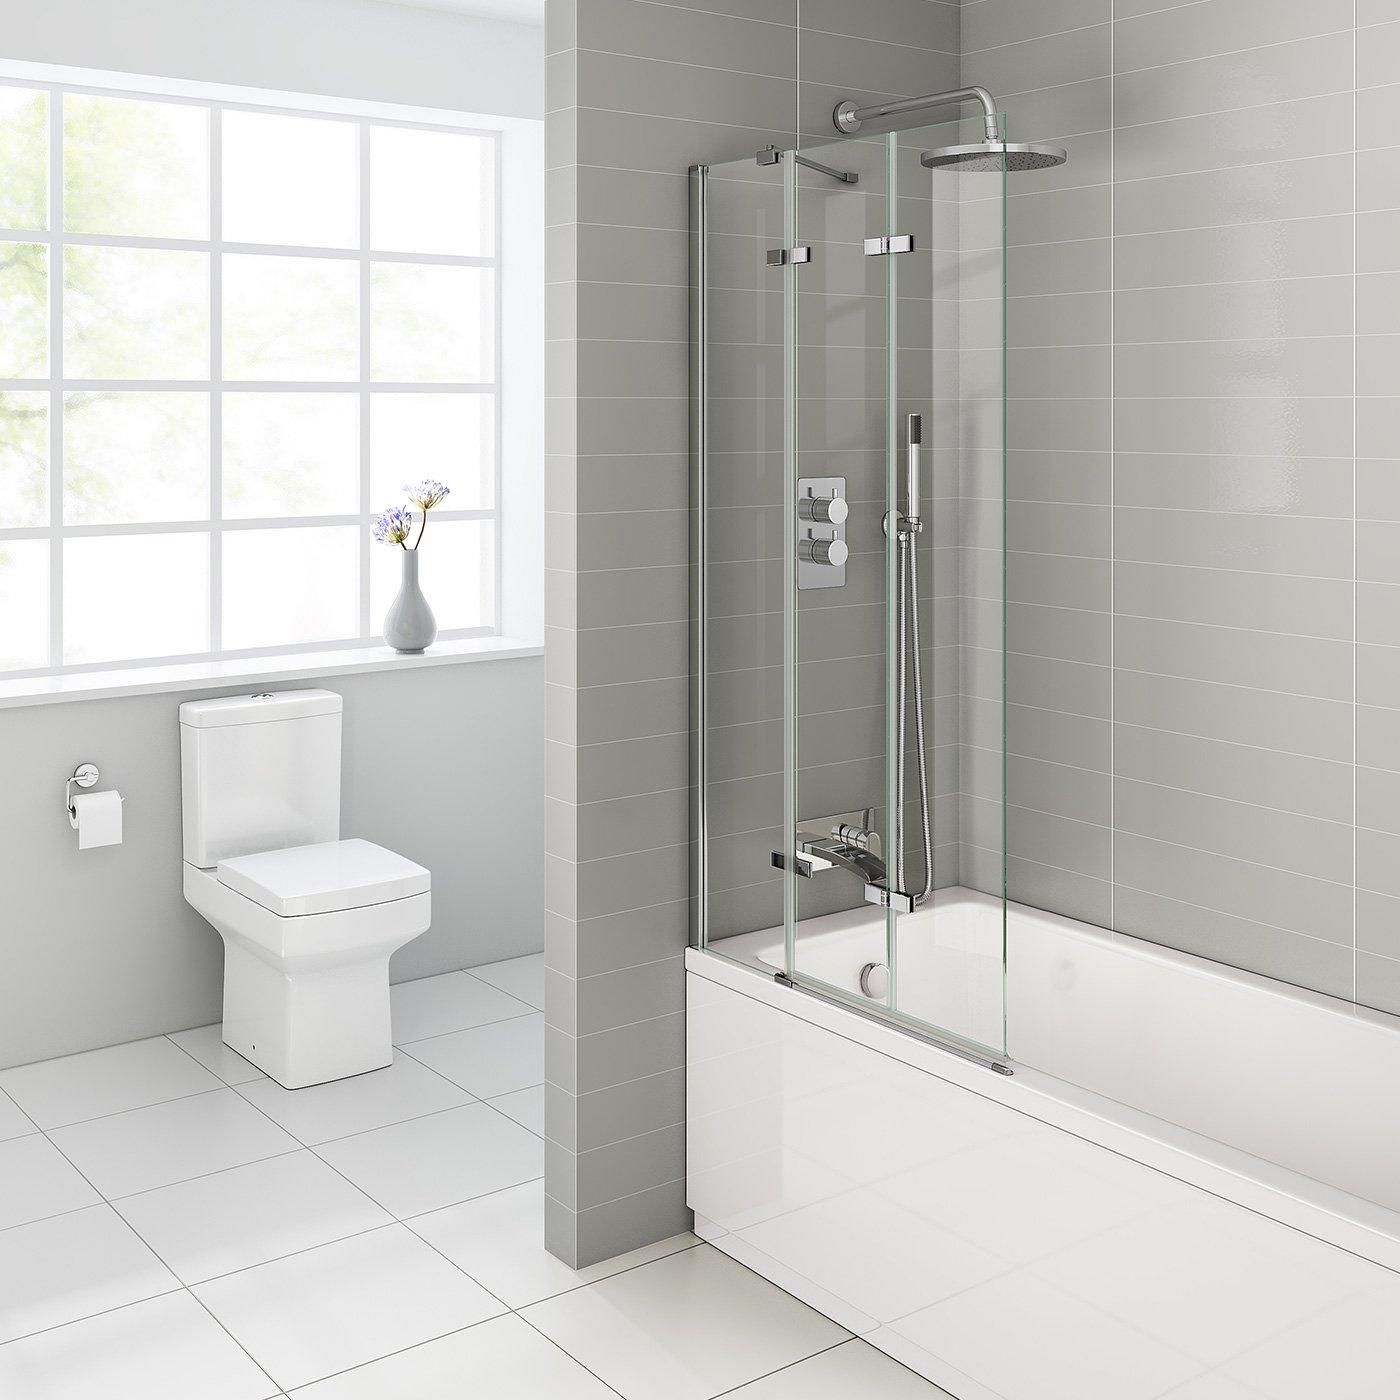 800mm luxury folding bath shower glass screen pivot door panel 800mm luxury folding bath shower glass screen pivot door panel left hand ibathuk amazon co uk kitchen home